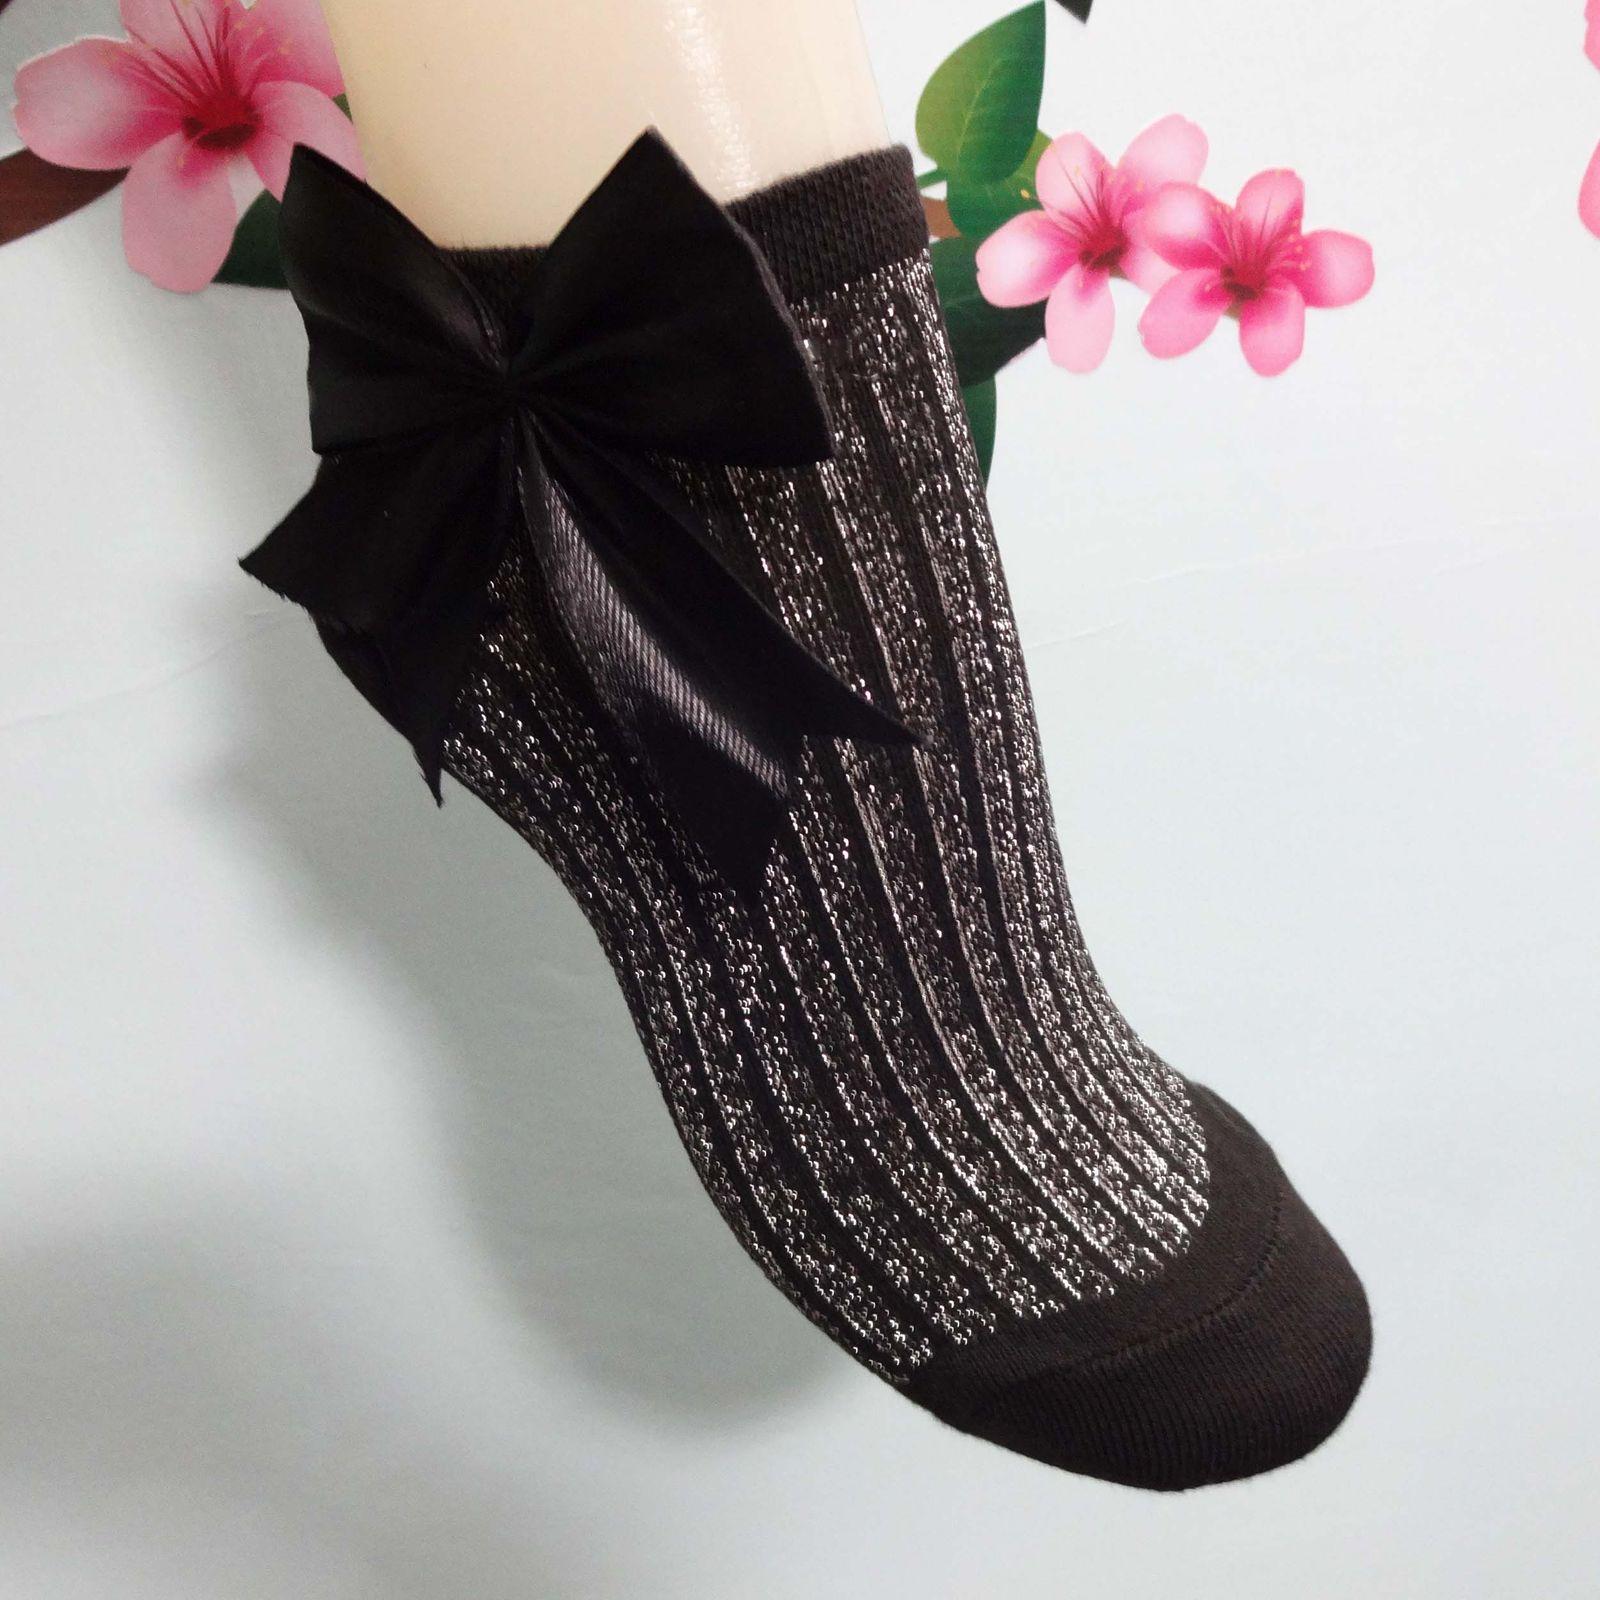 جوراب زنانه کد keb1 -  - 3